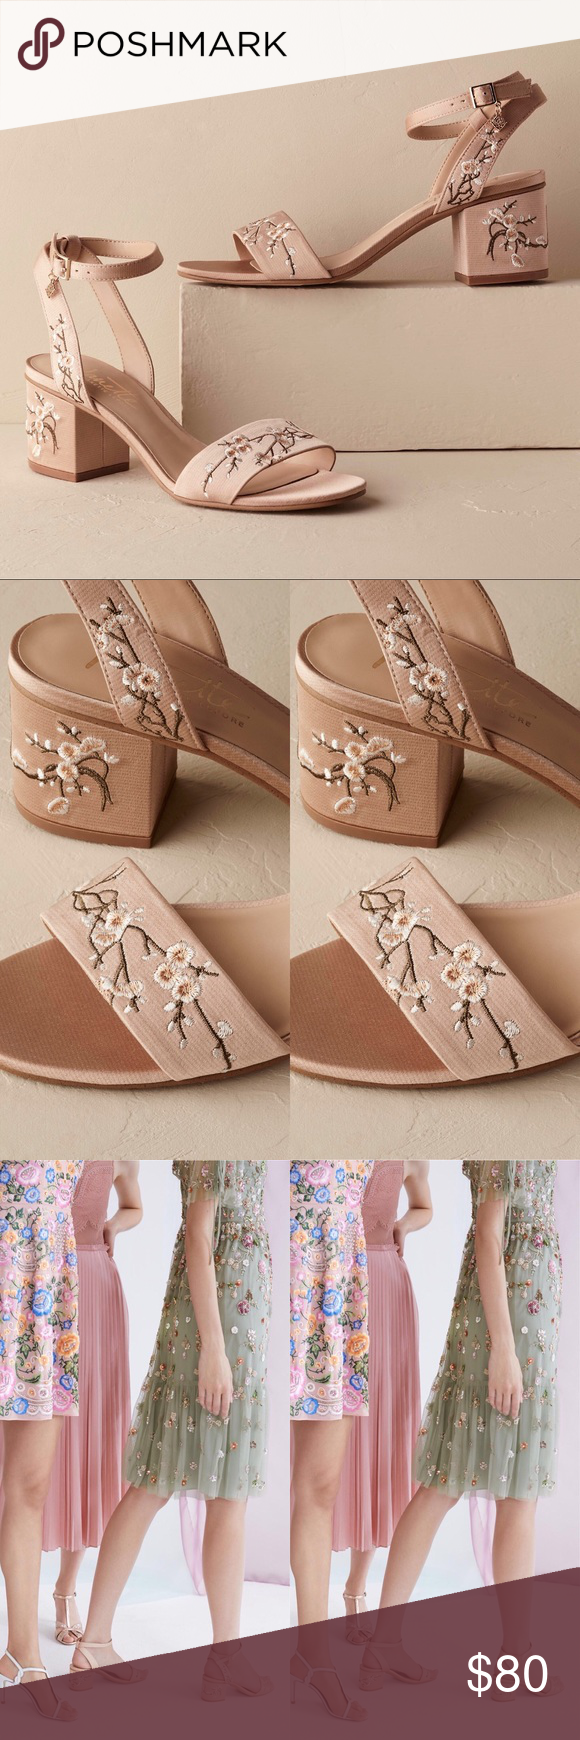 84a6d06b8deb4c Anthropologie x BHLDN Nanette Lepore Kierna Sandal Anthropologie x BHLDN  Nanette Lepore Kierna Embroidered Sandal MSRP